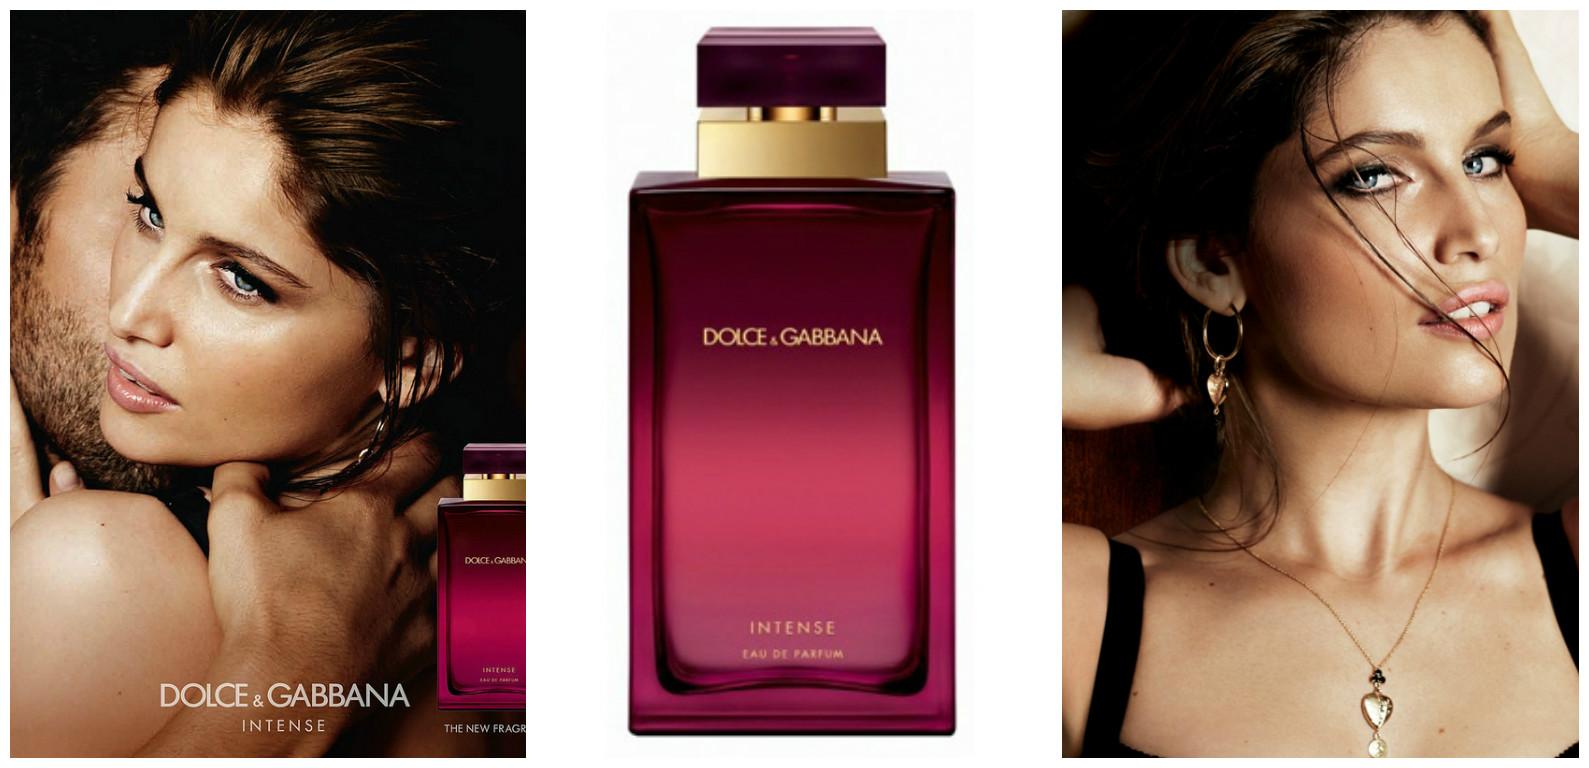 DOLCE&GABBANA Pour Femme Intense Perfume Review